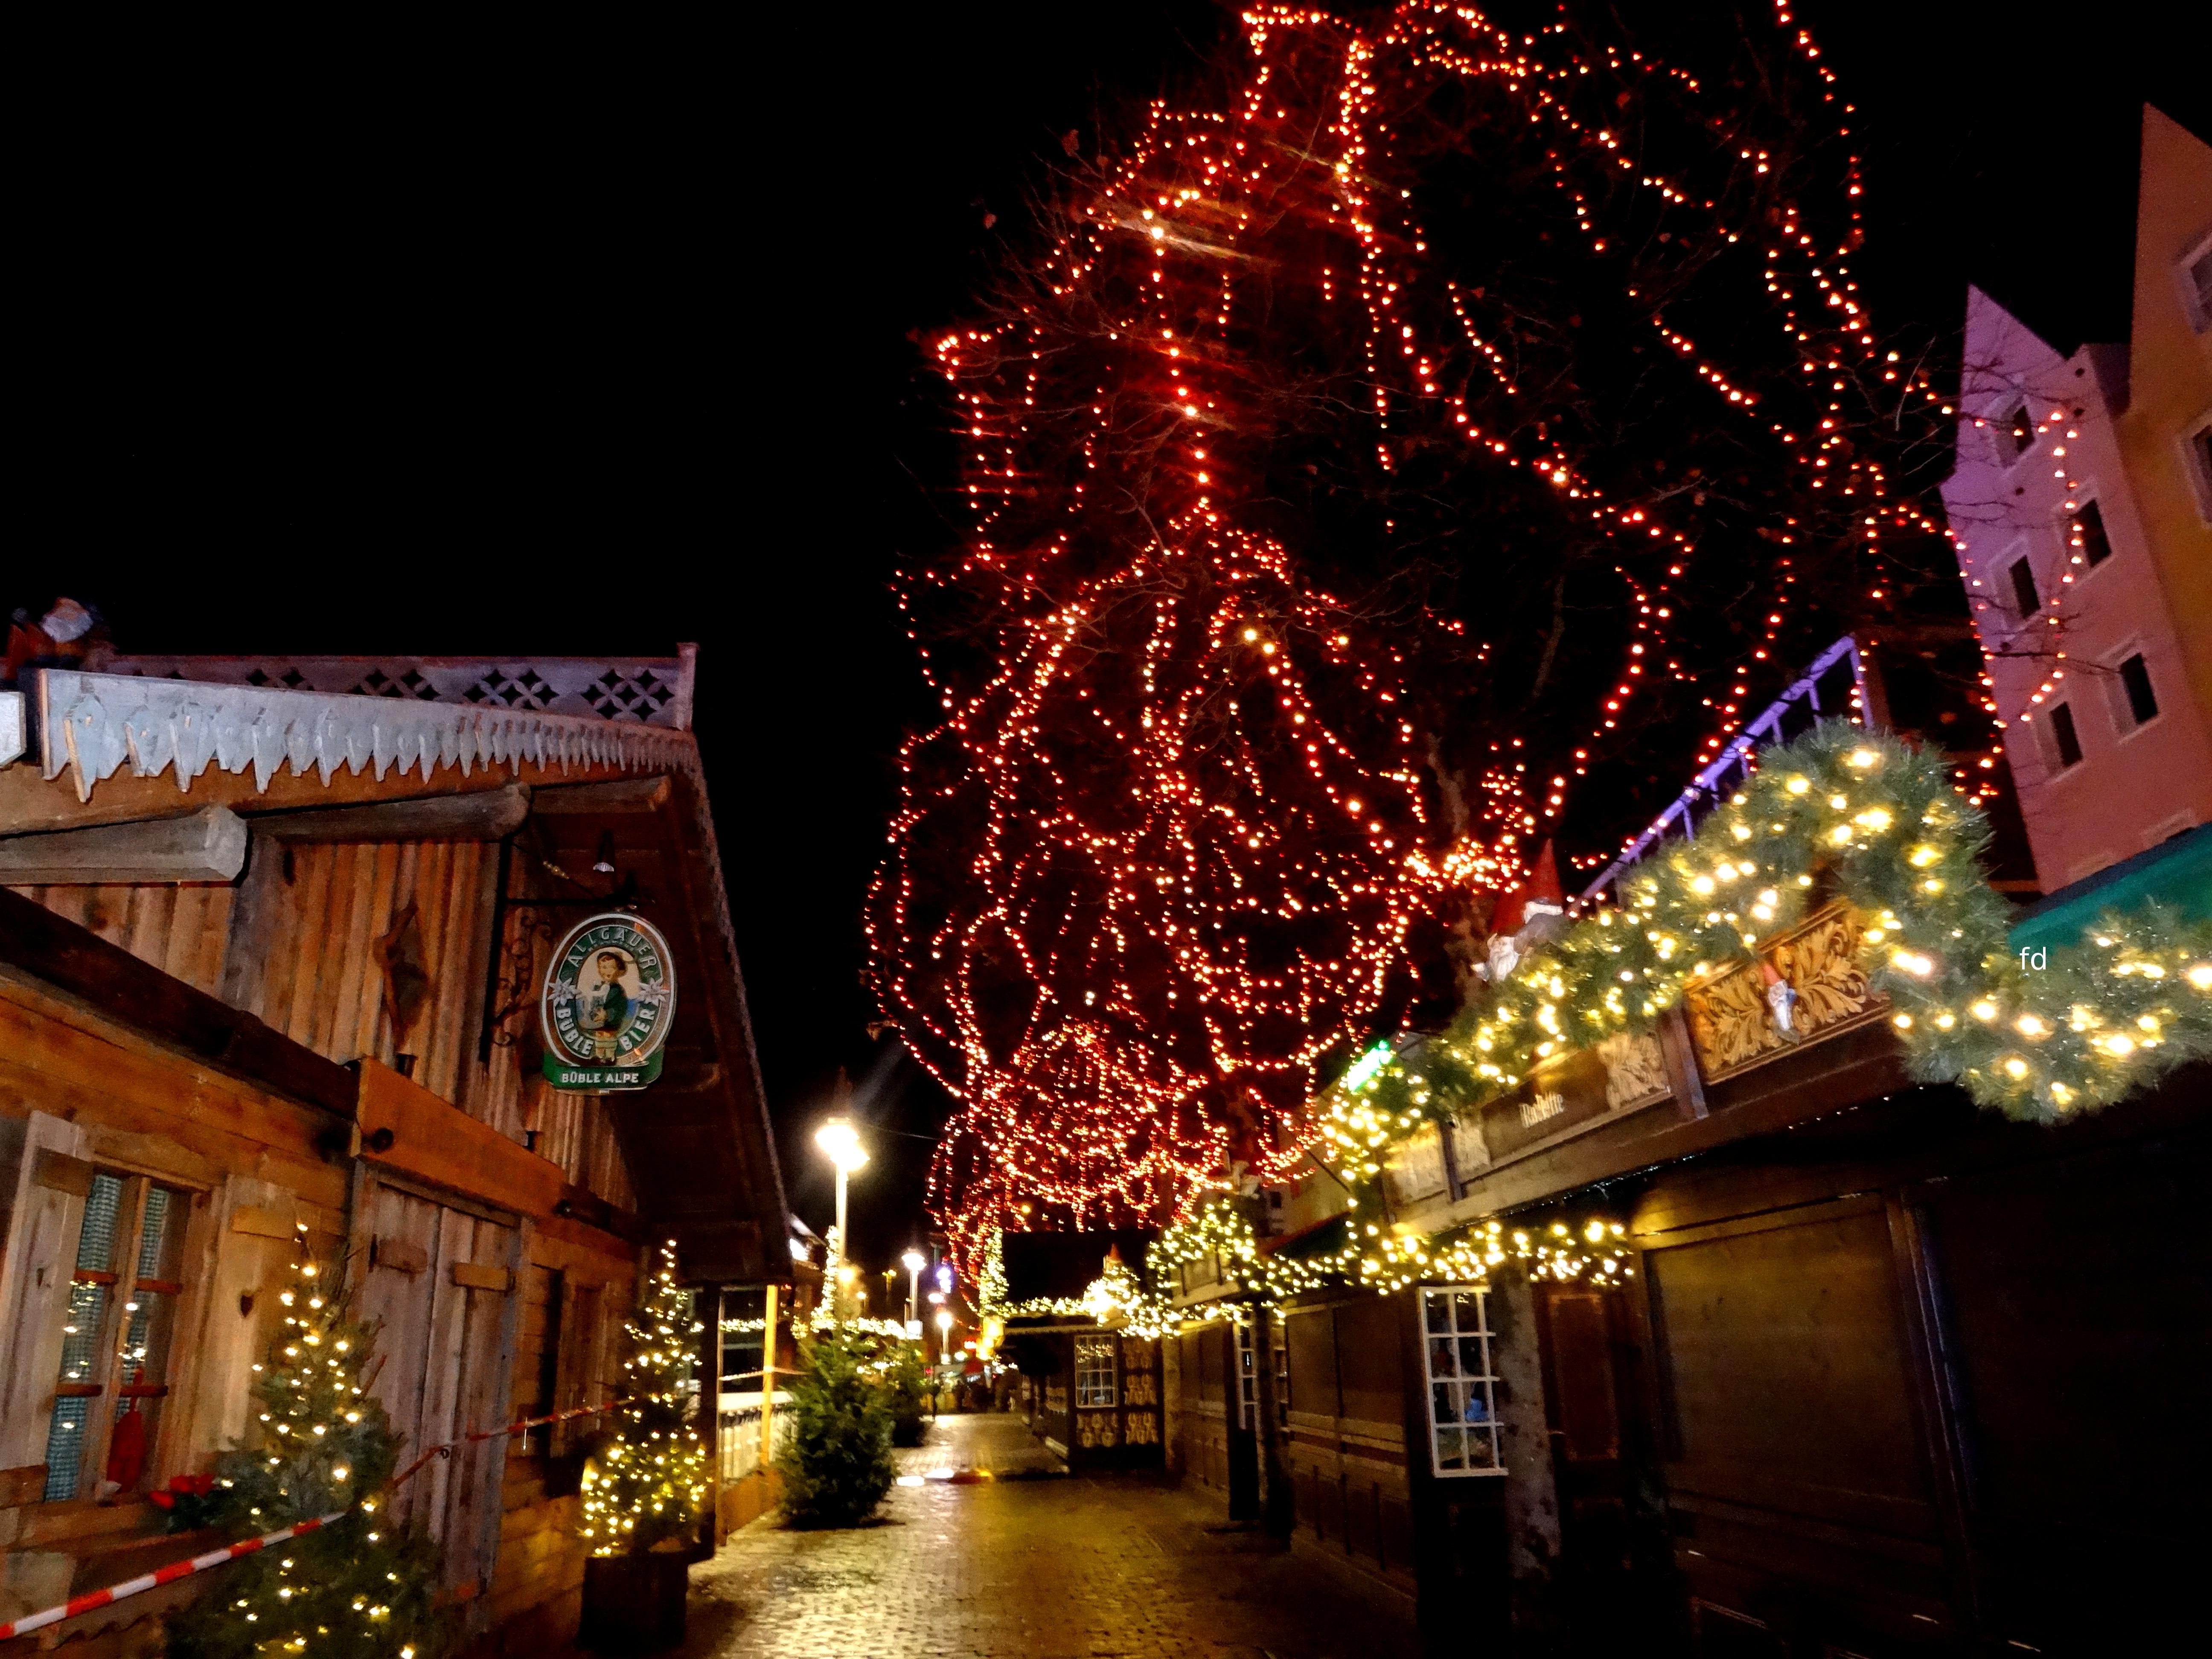 File:Köln Weihnachten am Dom 10.JPG - Wikimedia Commons